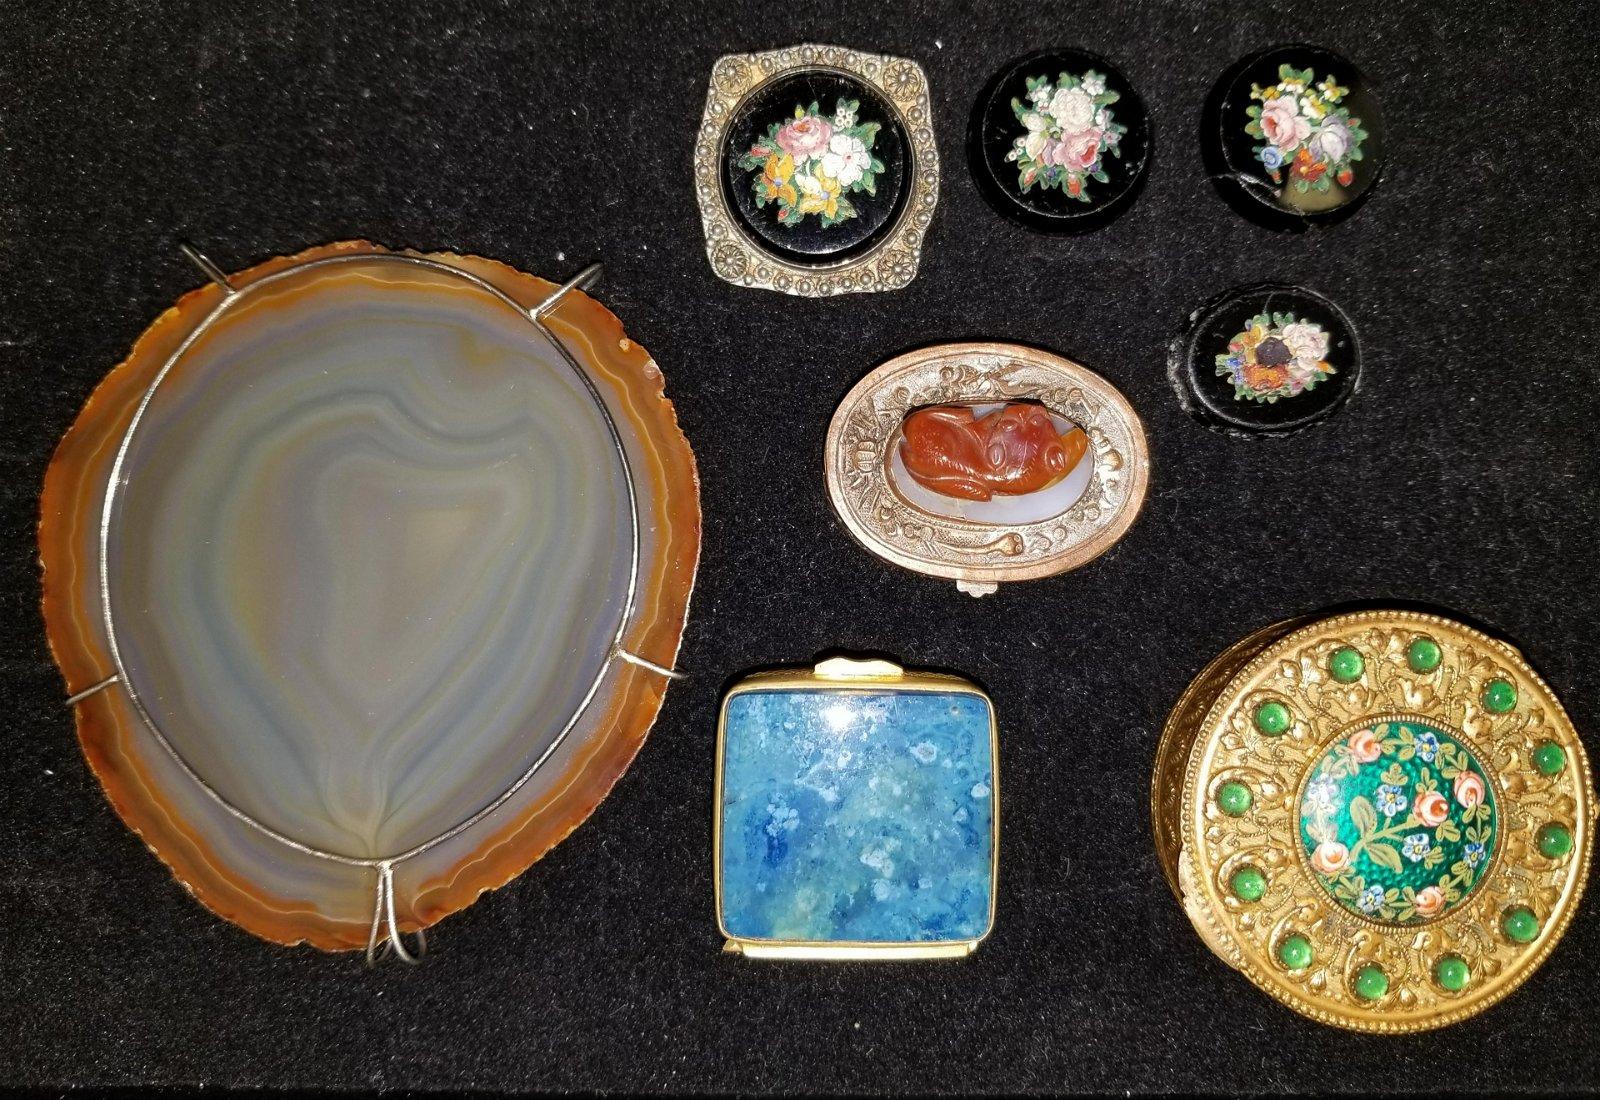 8 Piece lot of Hard Stone & Enameled items